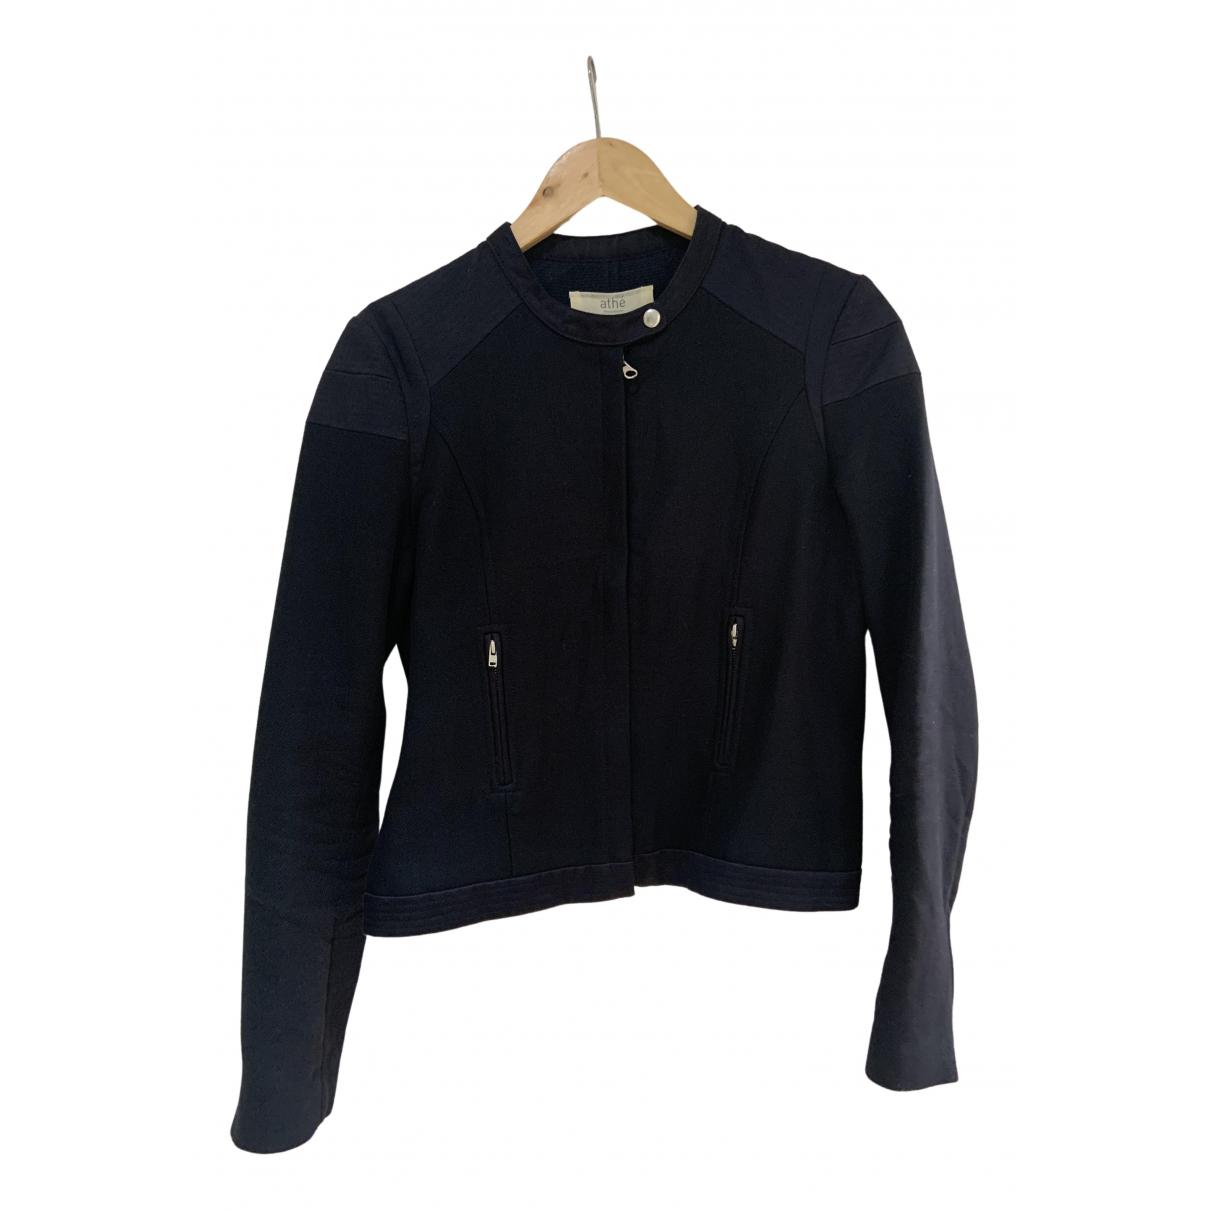 Vanessa Bruno Athe \N Navy Cotton jacket for Women 40 FR